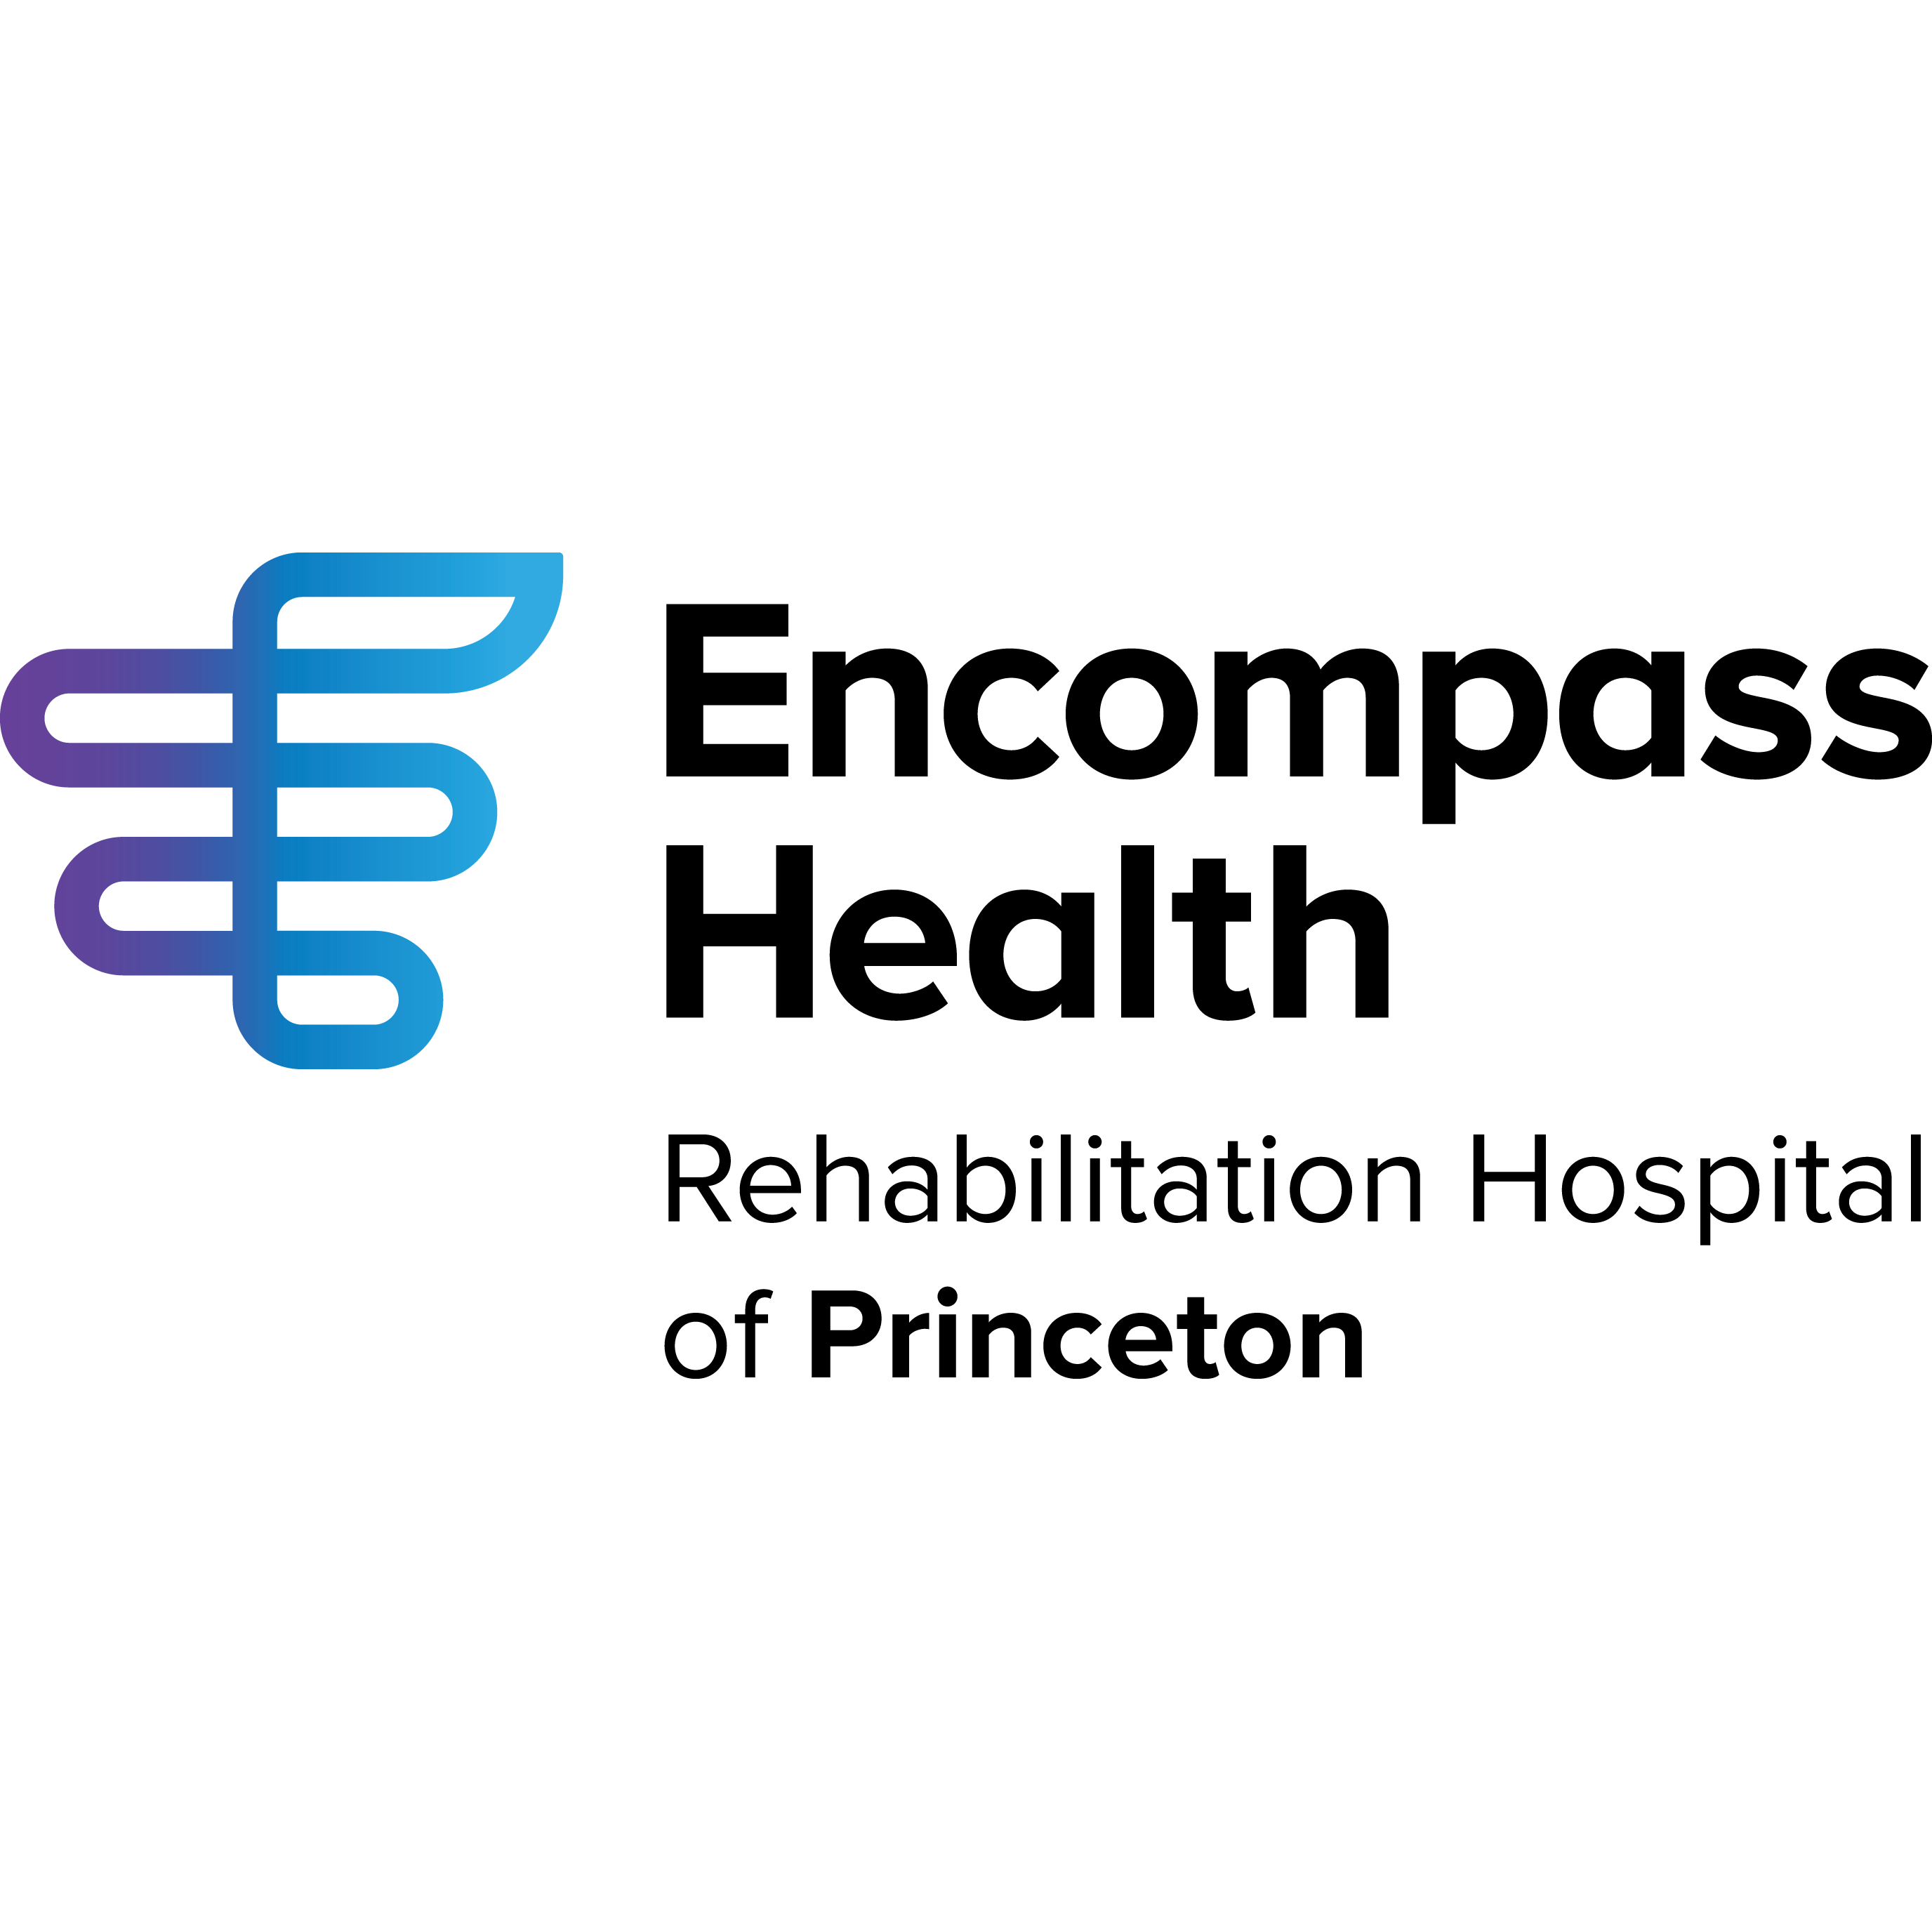 Encompass Health Rehabilitation Hospital of Princeton